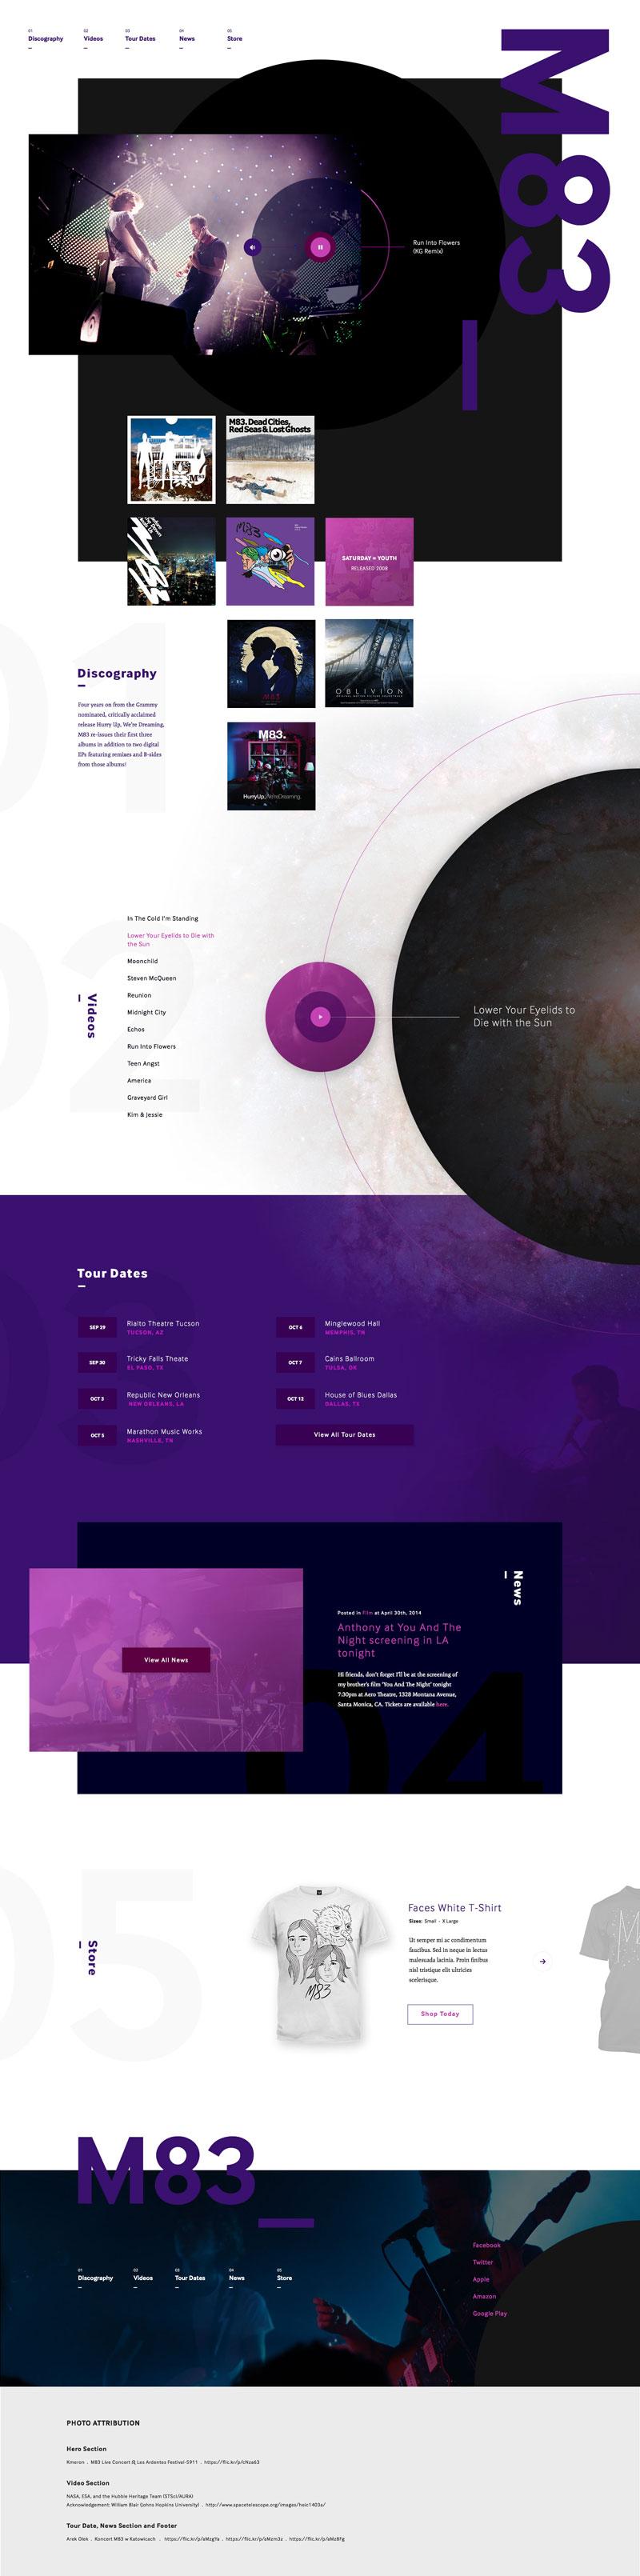 Creative Music Website Designs for Inspiration